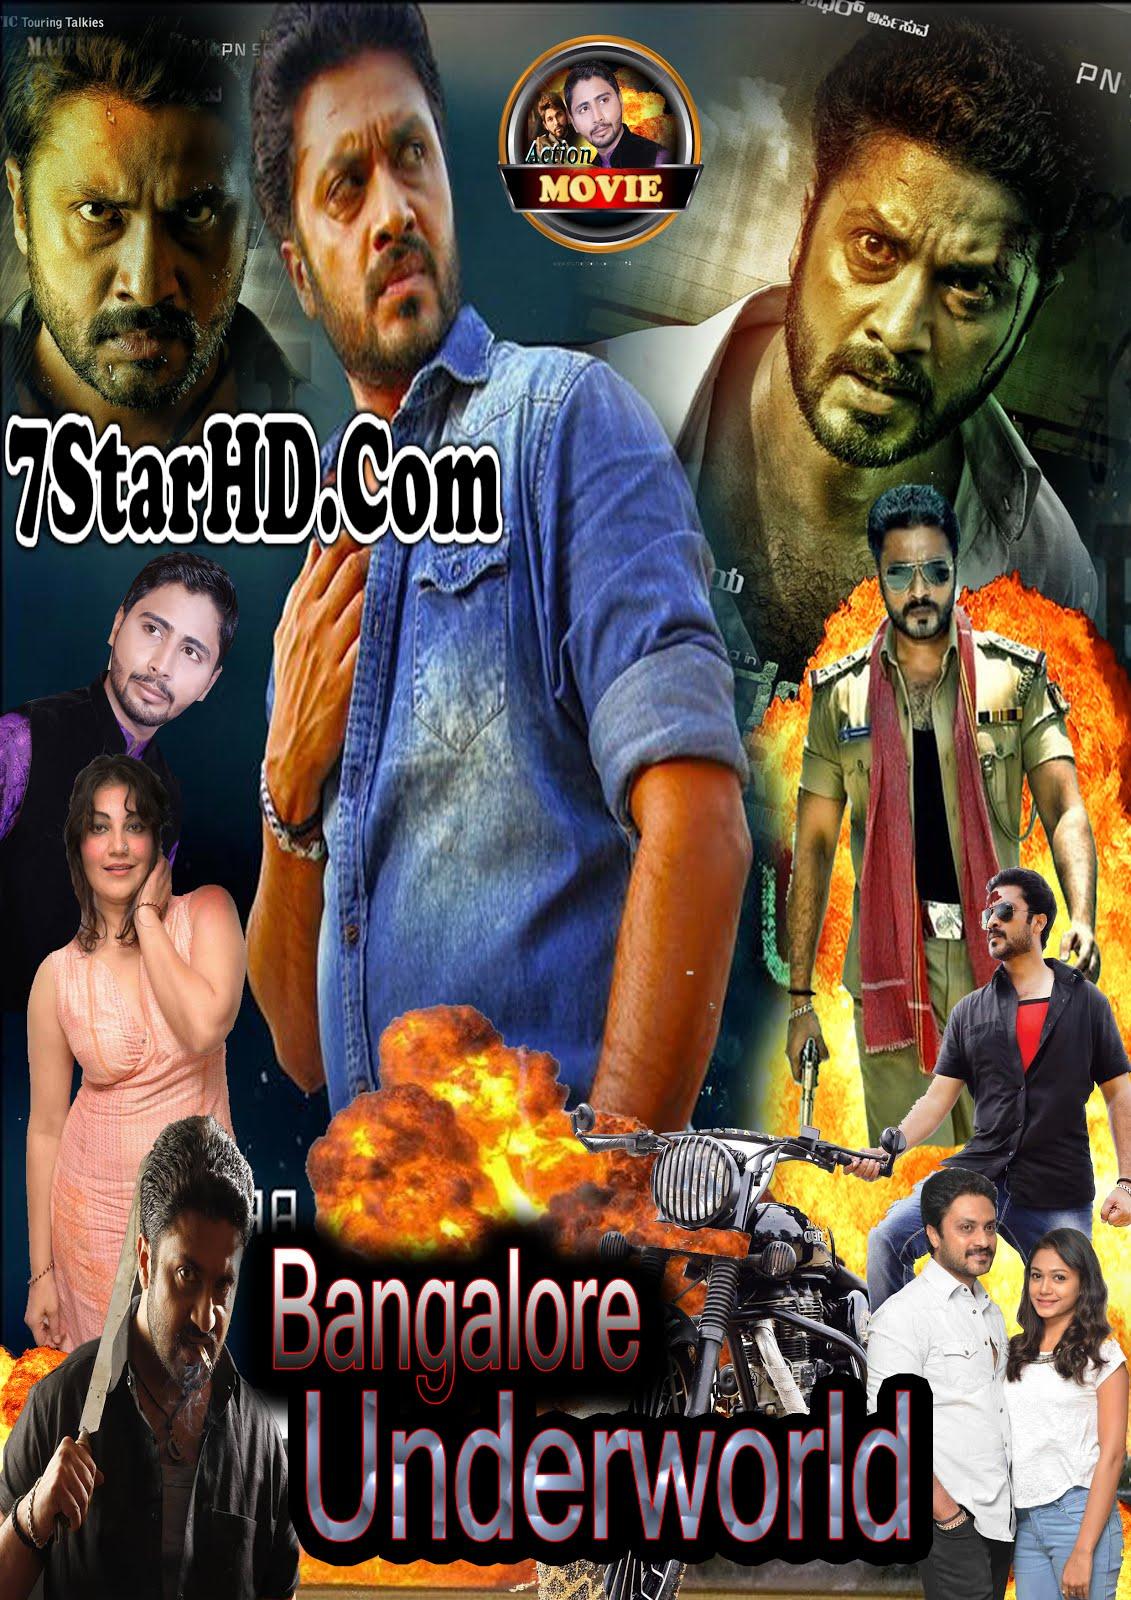 Bengaluru Underworld 2018 Hindi Dubbed 300MB HDTVRip 480p x264